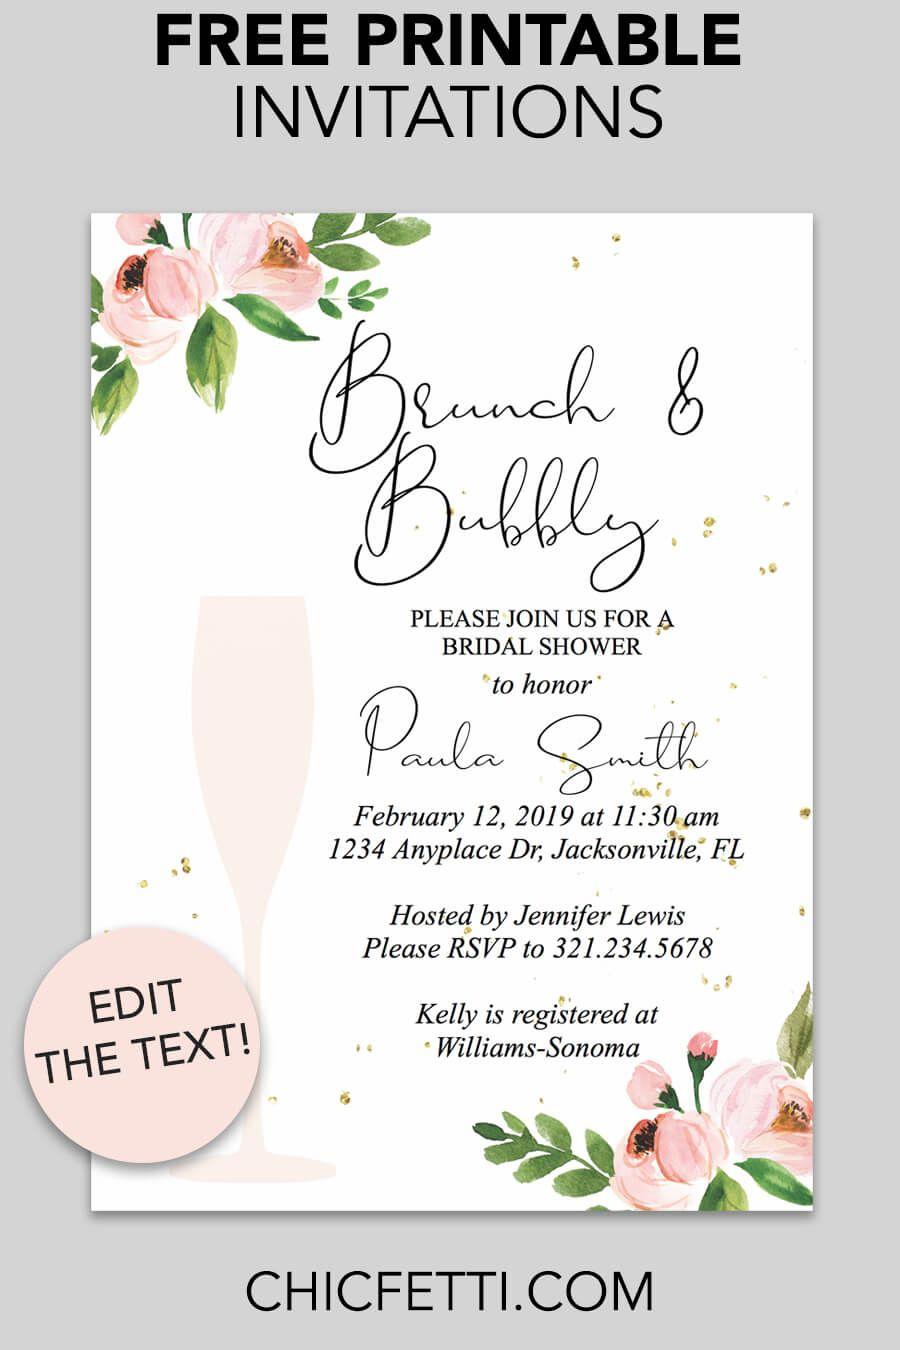 Bridal Shower Printable Invitation (Floral Bubbly   Invitations - Free Printable Bridal Shower Invitations Templates